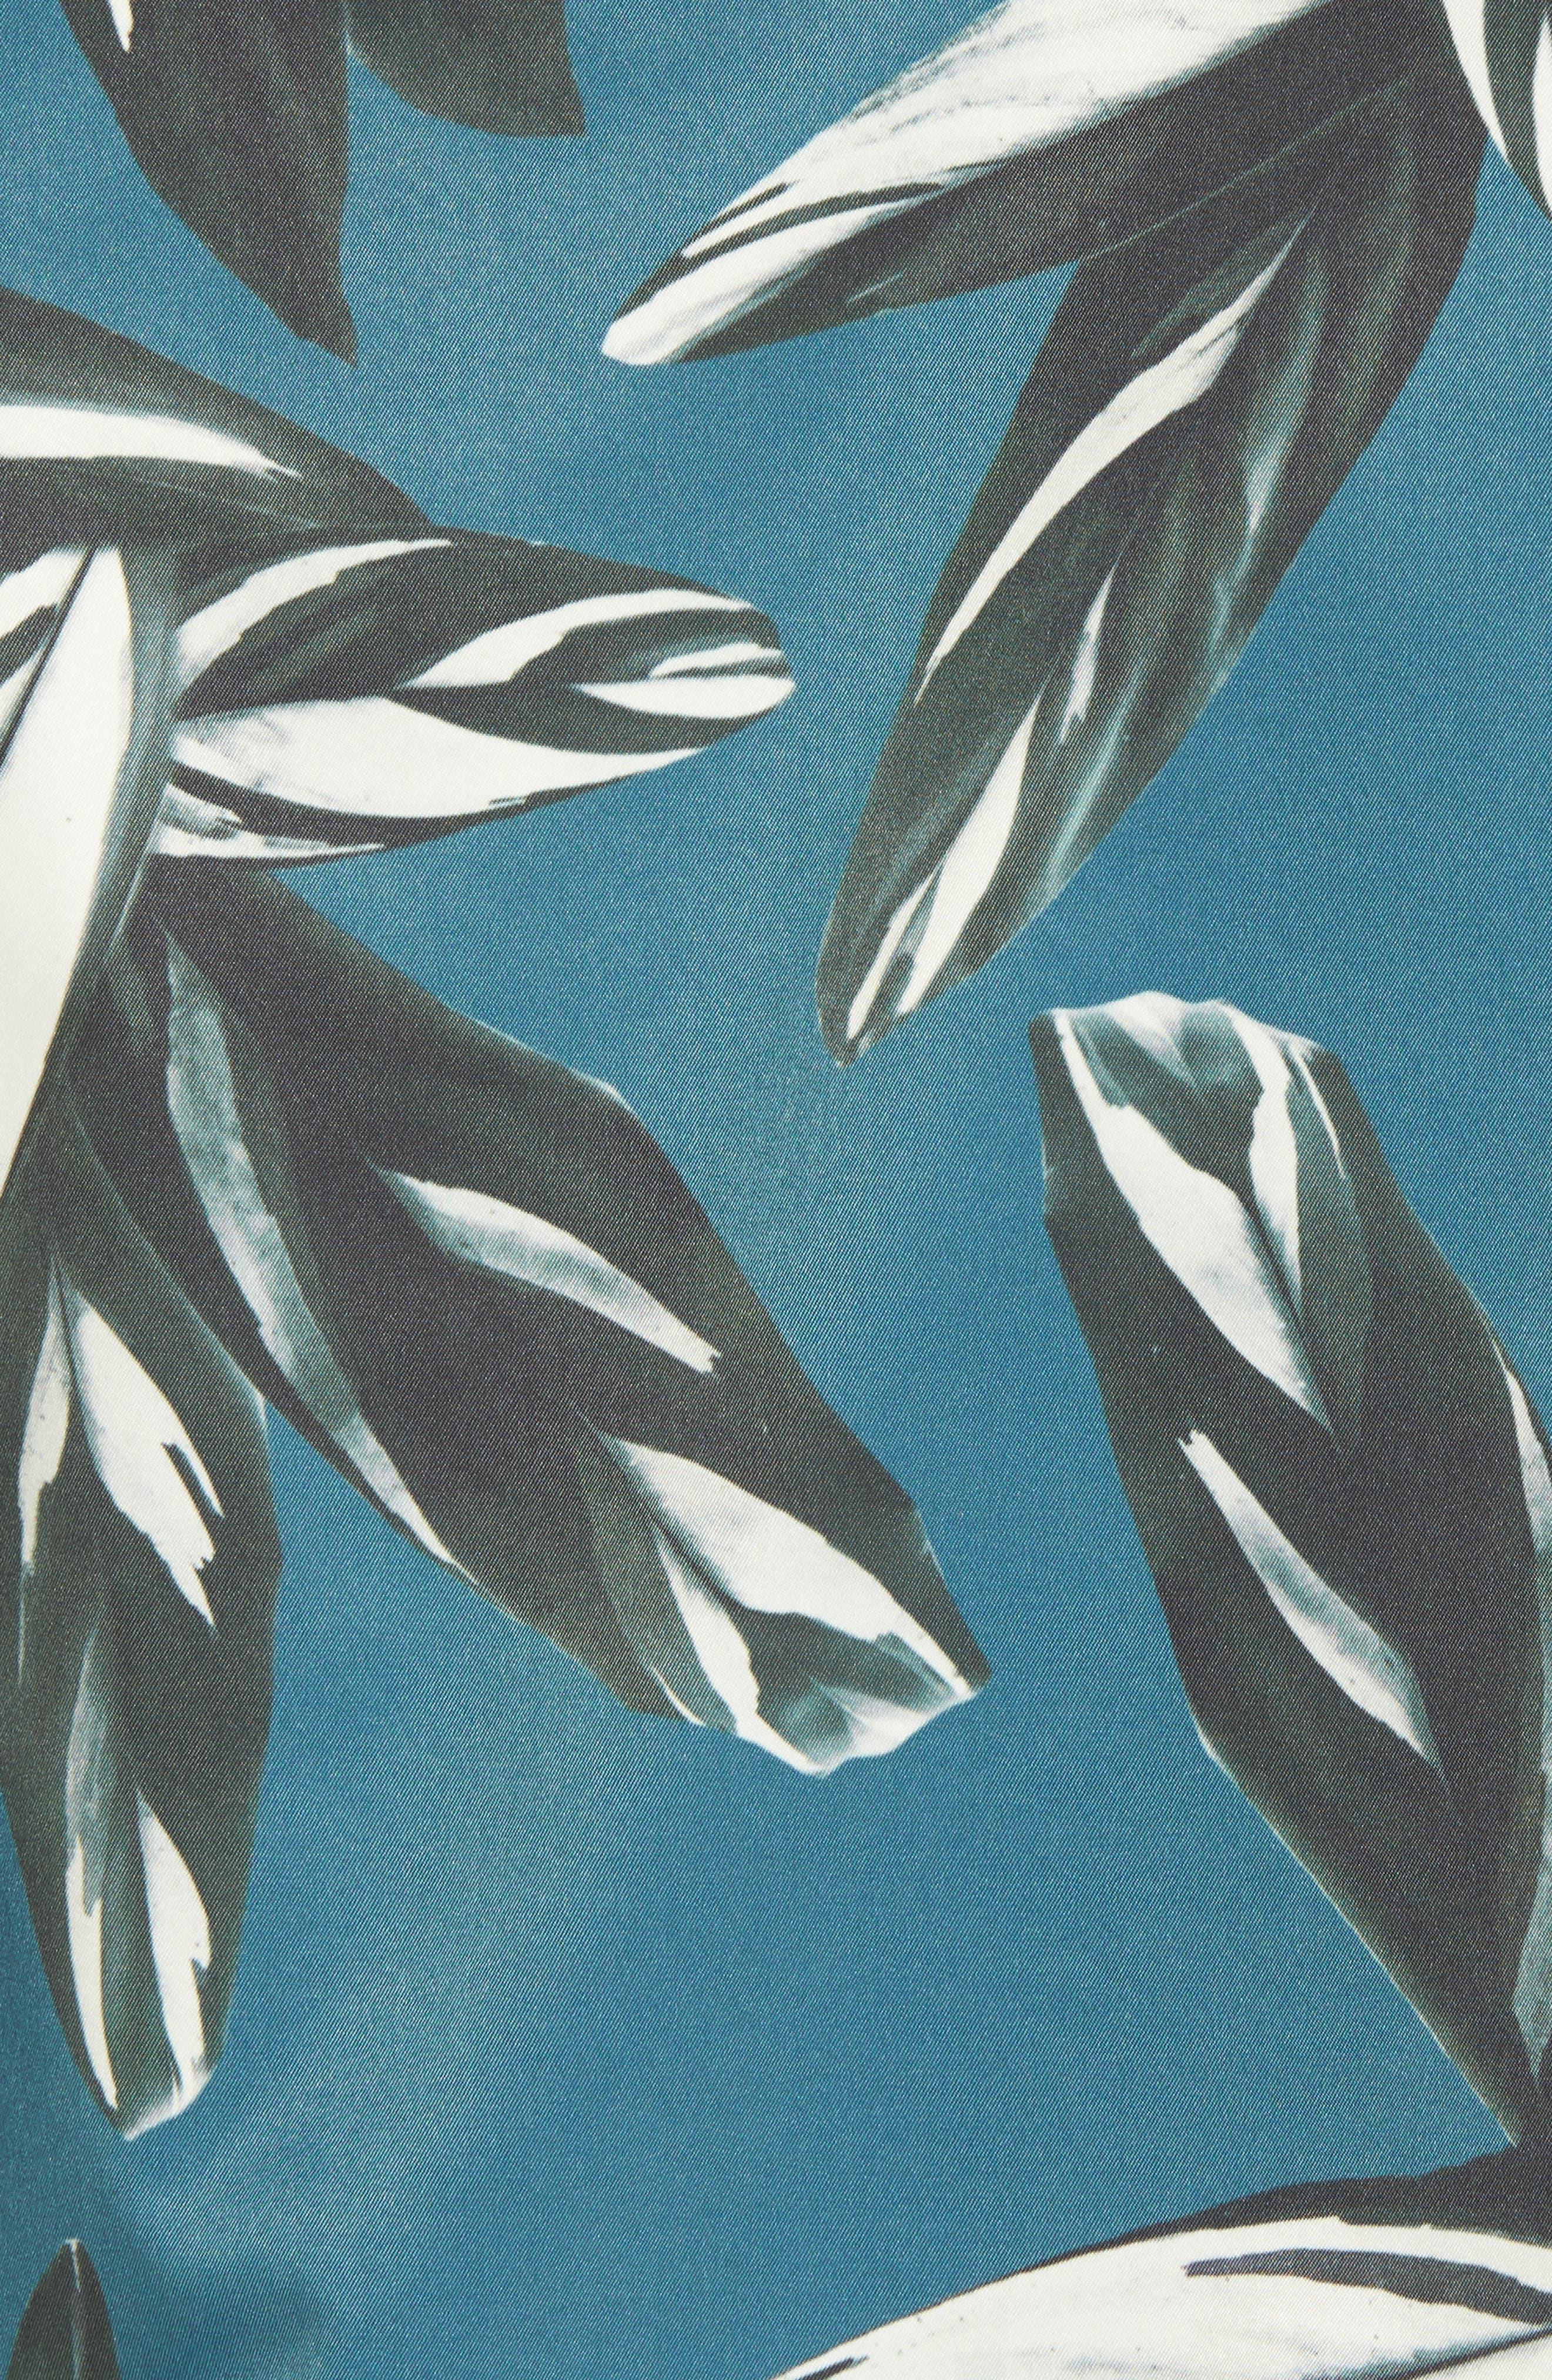 Toth Bomber Jacket,                             Alternate thumbnail 5, color,                             Teal